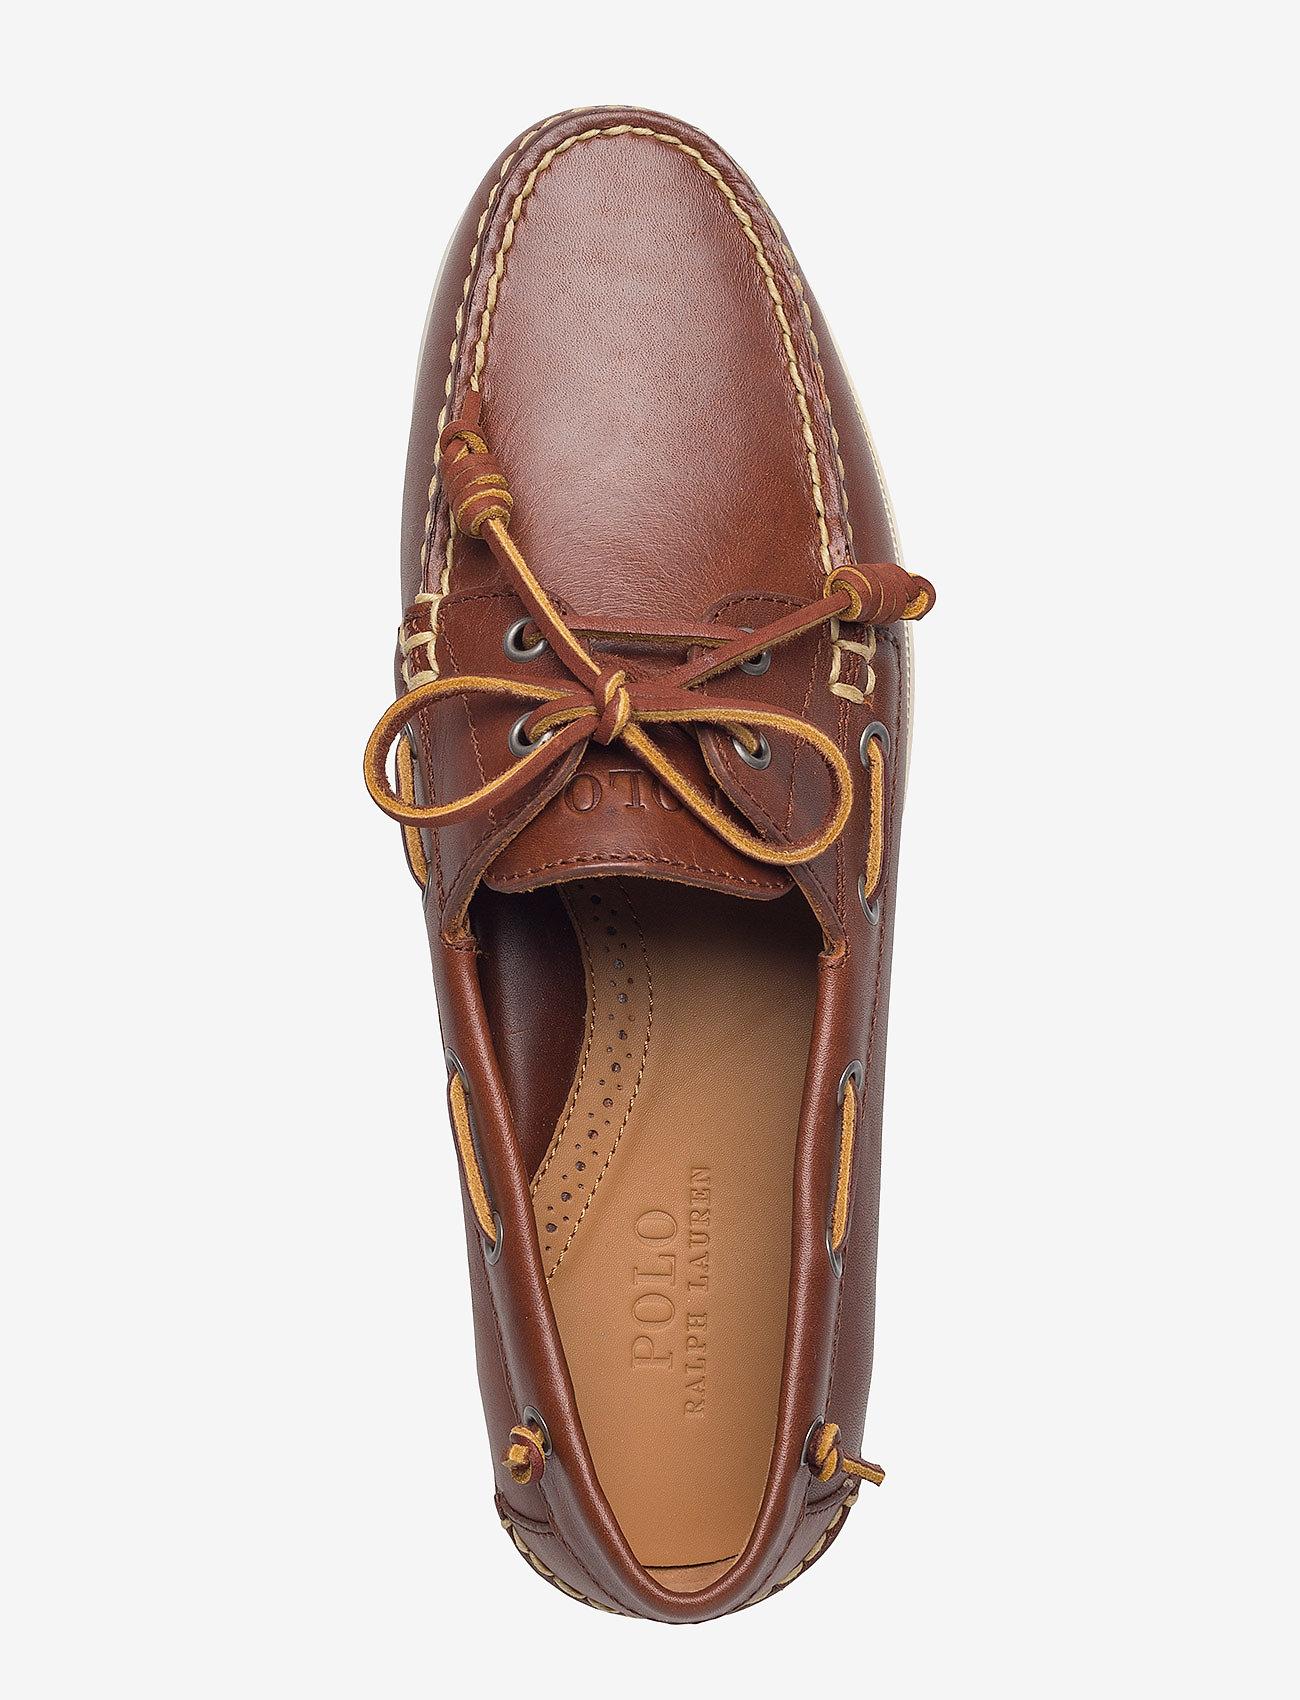 Merton Leather Boat Shoe (Deep Saddle Tan) - Polo Ralph Lauren